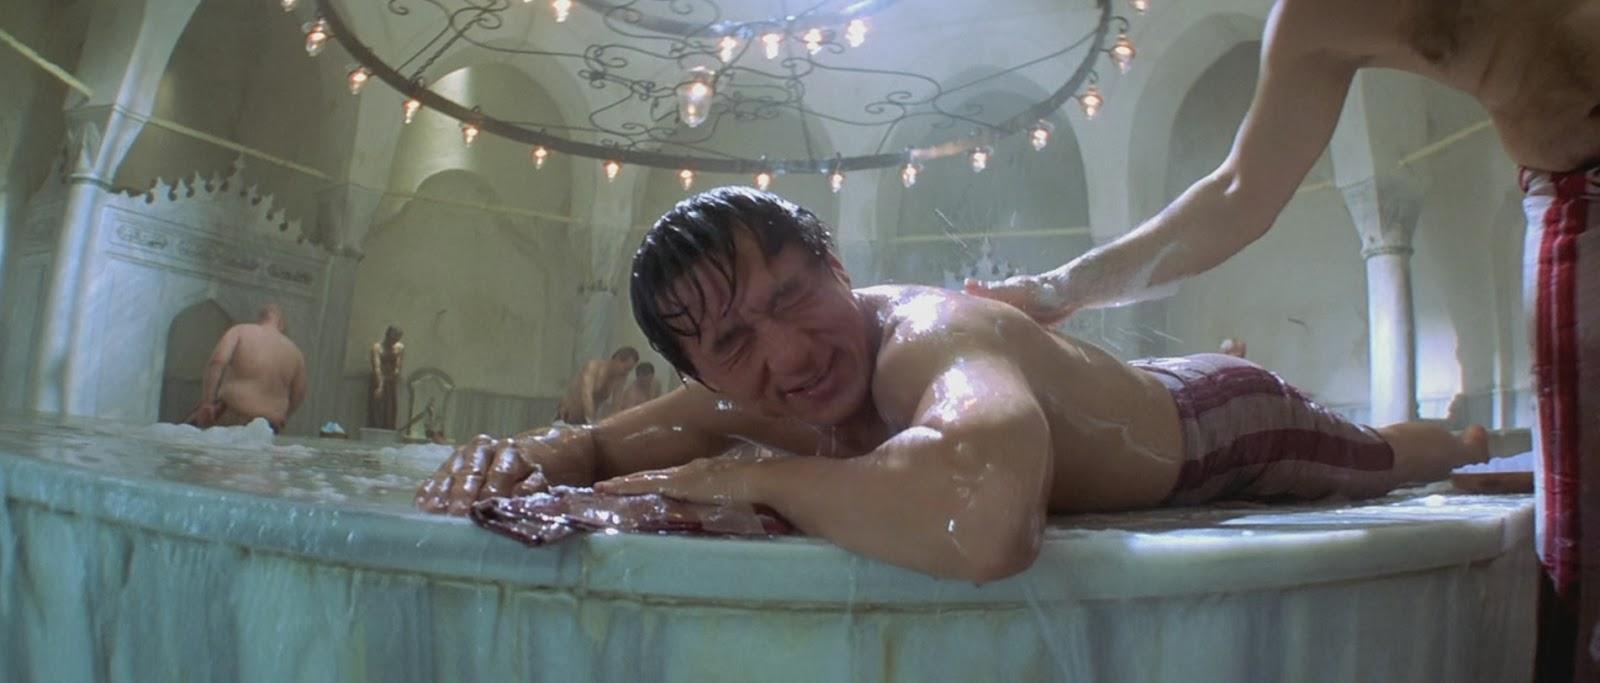 Nude turkish bath gif videos